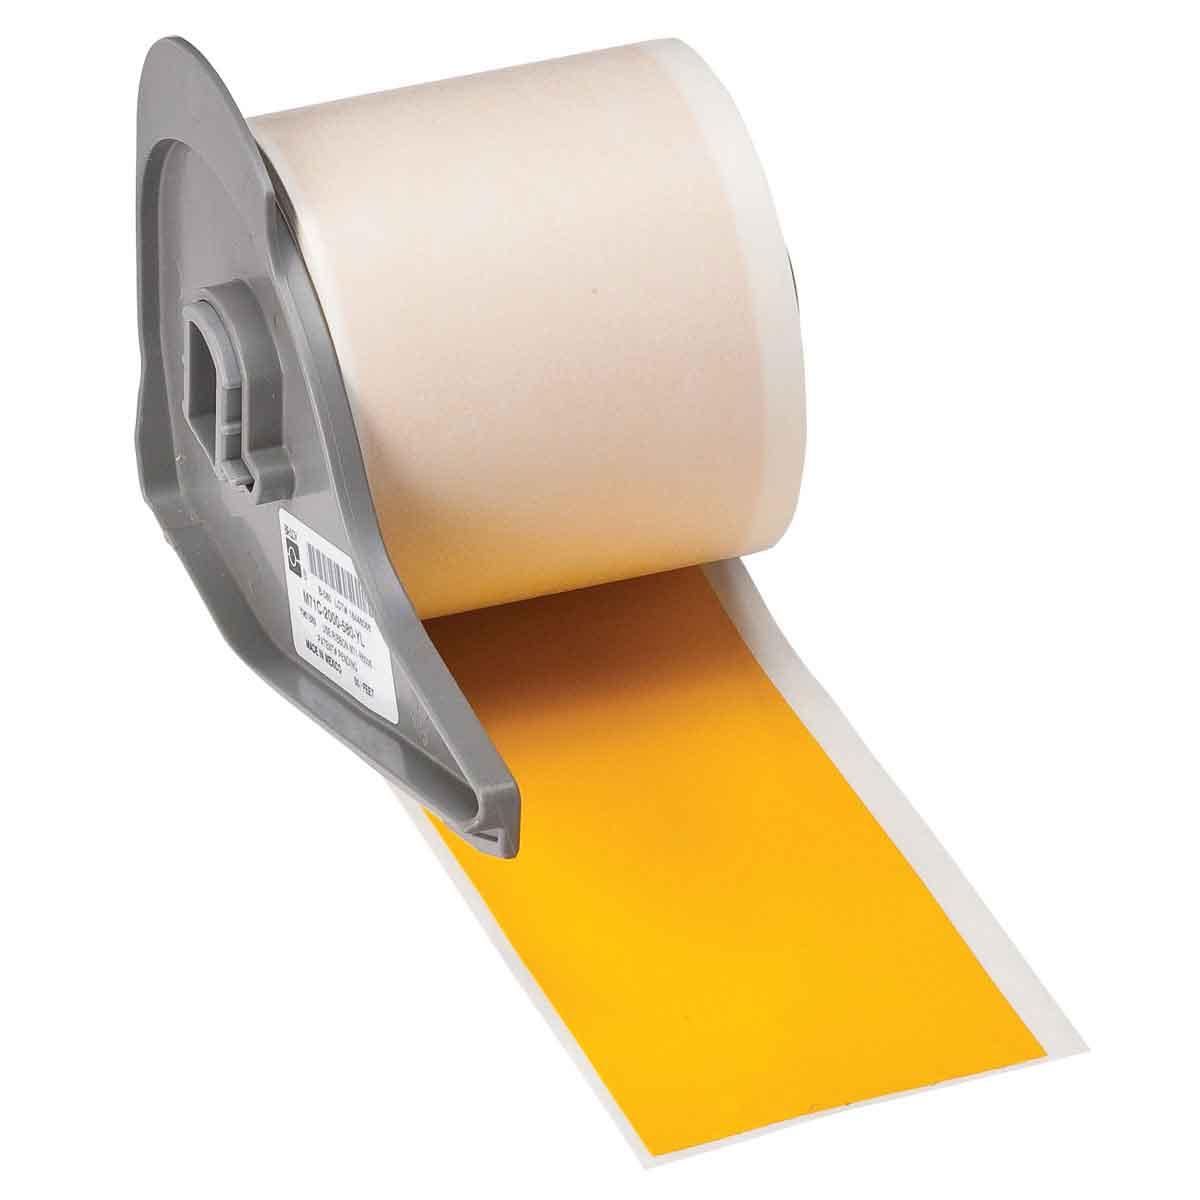 Brady® M71C-2000-595-YL Blank Thermal Transfer Tape, 50 ft L x 2 in W, Yellow, B-595 Vinyl, Permanent Acrylic Adhesive, -40 to 180 deg F